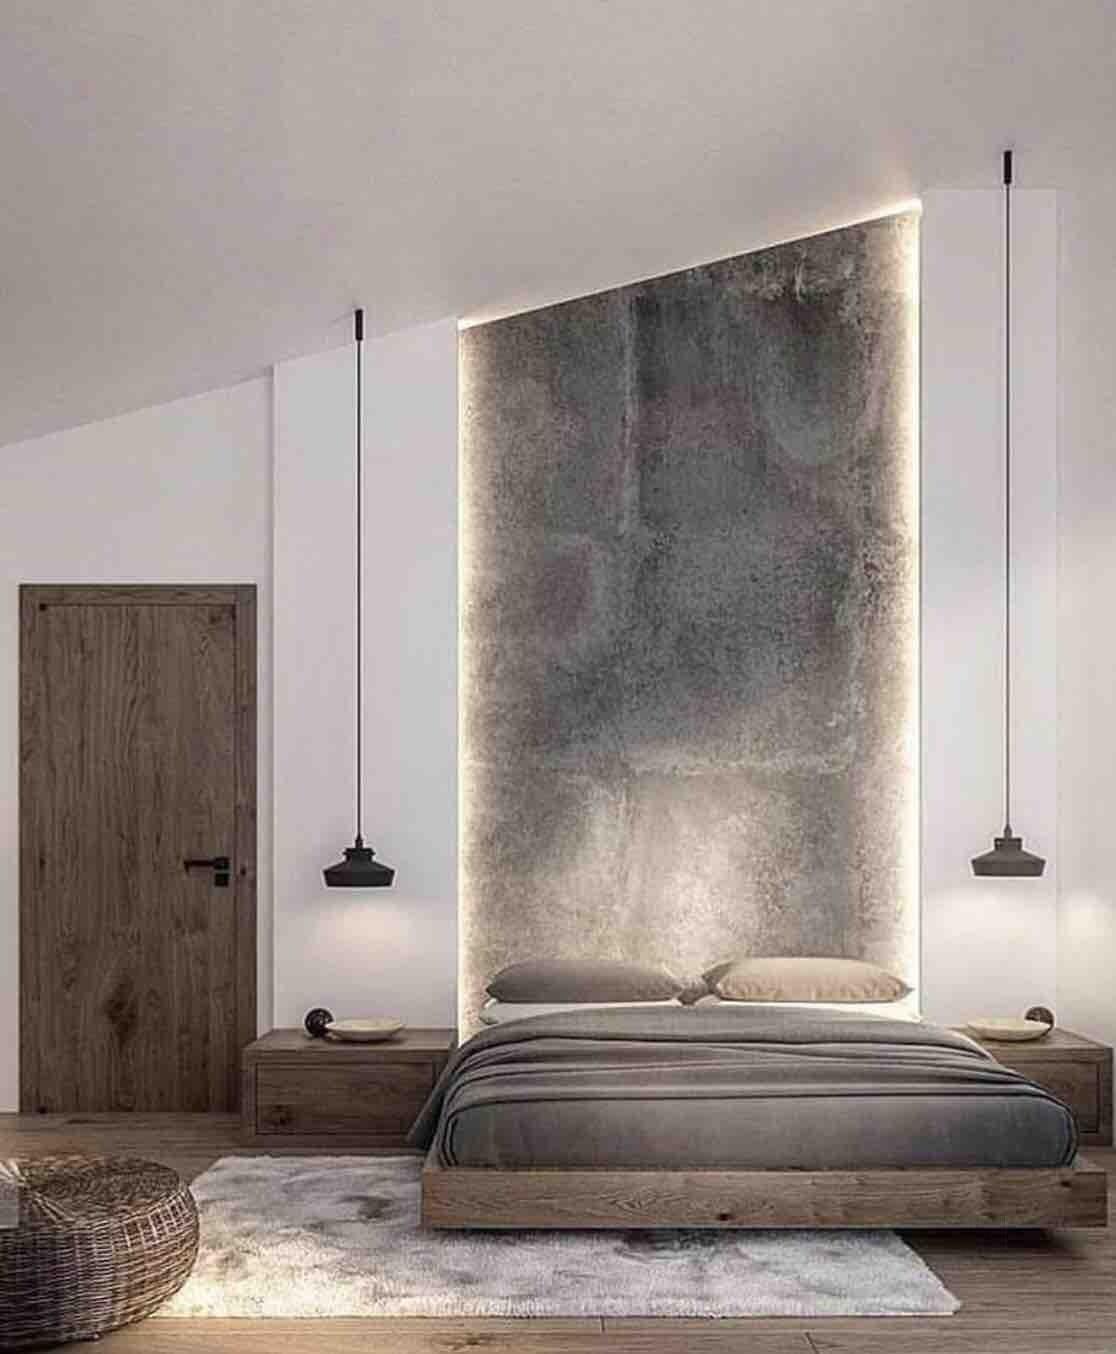 30 Stunning Modern Bedroom Design Ideas For 2019 Interior Design